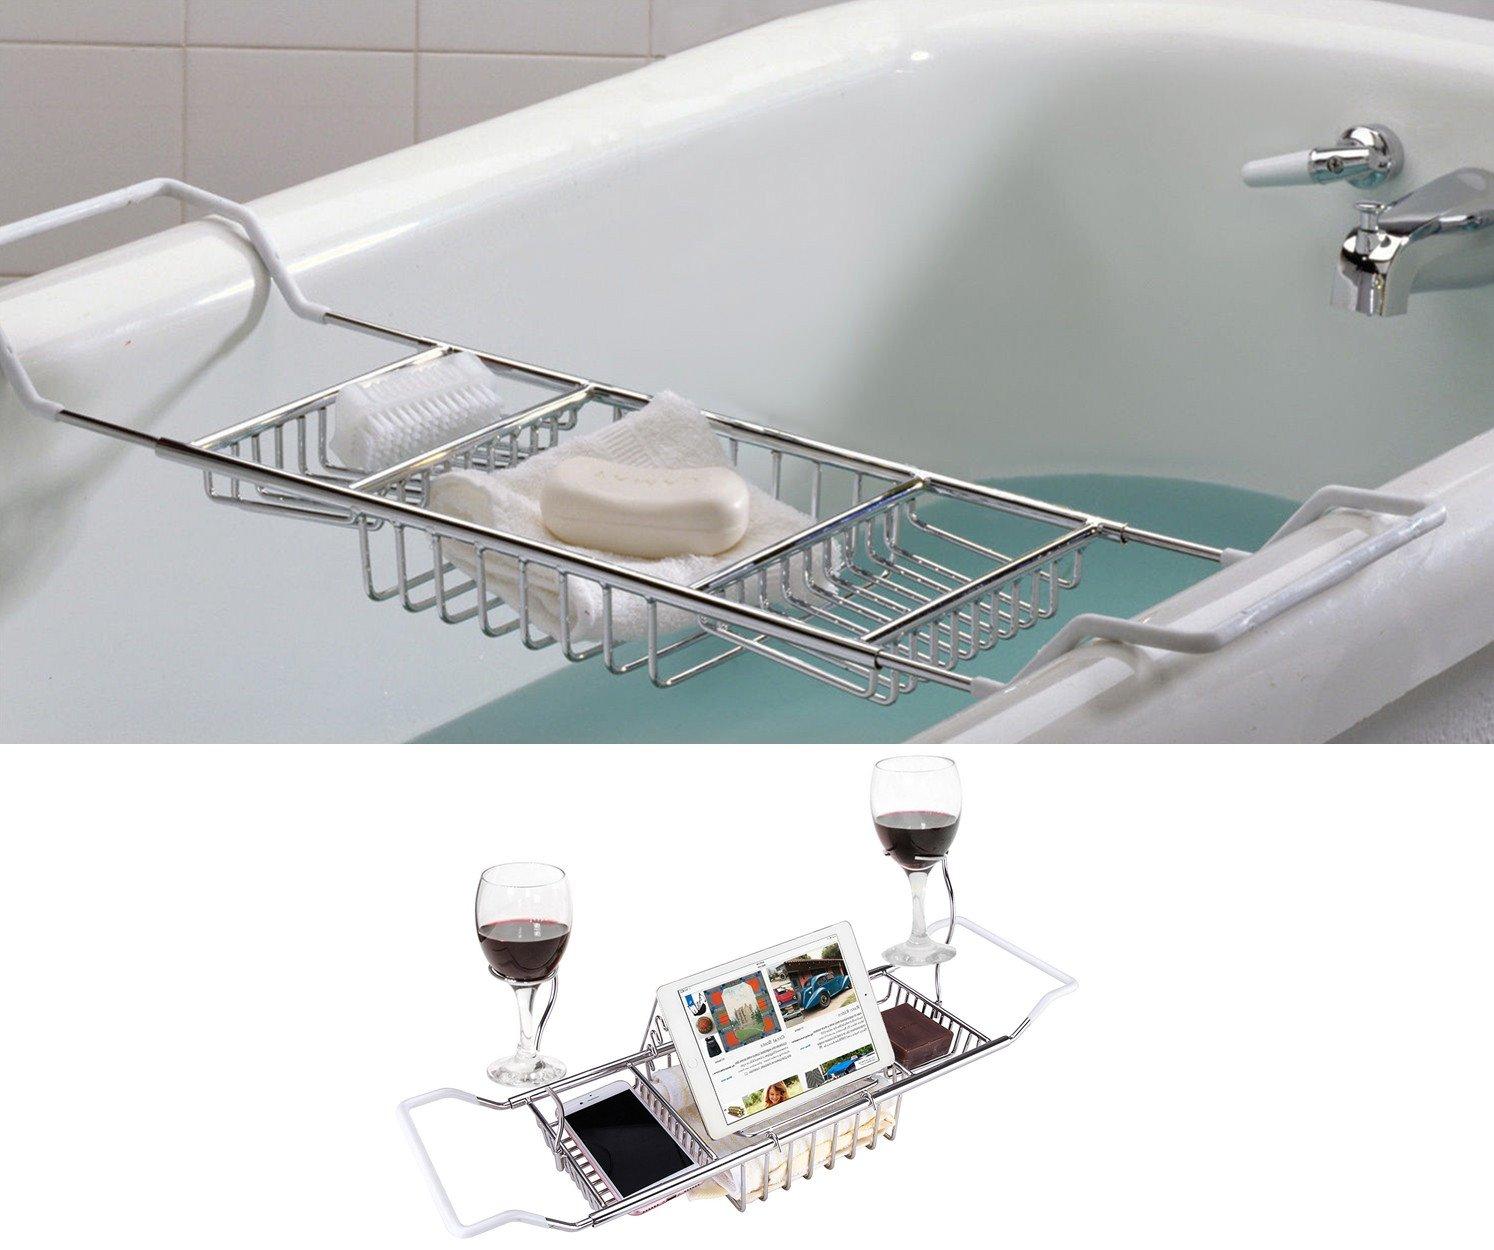 iPEGTOP 304 Stainless Steel Over Bath Tub Racks Shower Organizer ...